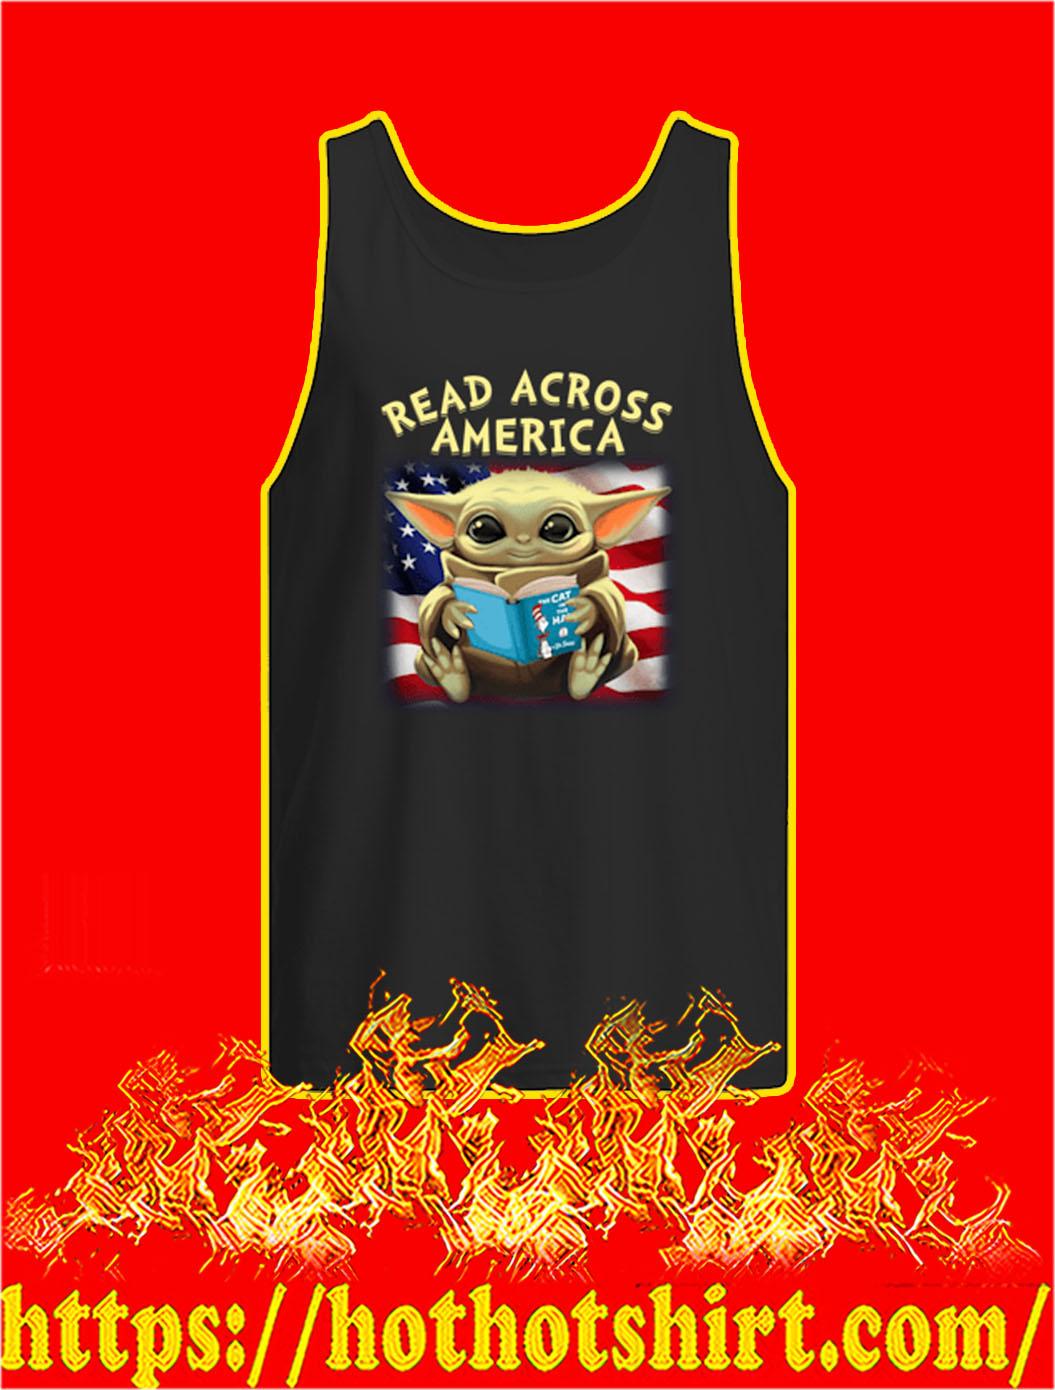 Baby Yoda Read Across America tank top